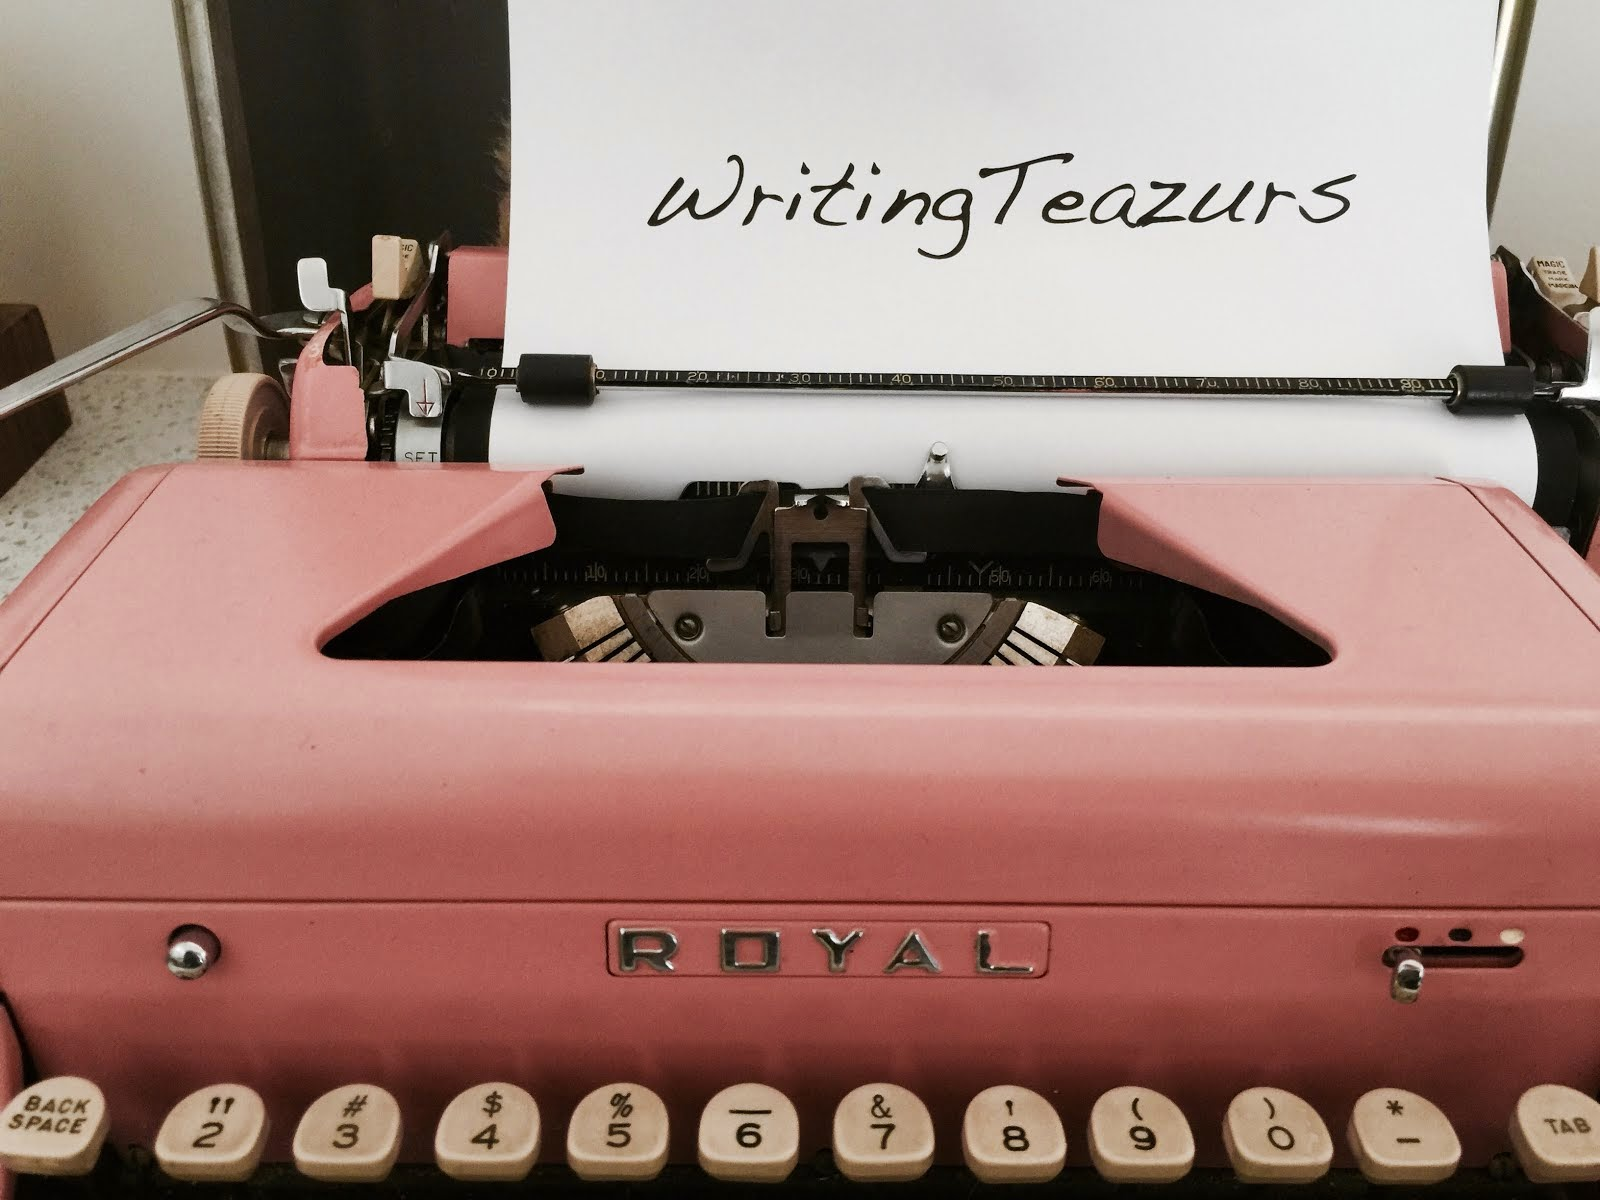 WRITING TEAZURS